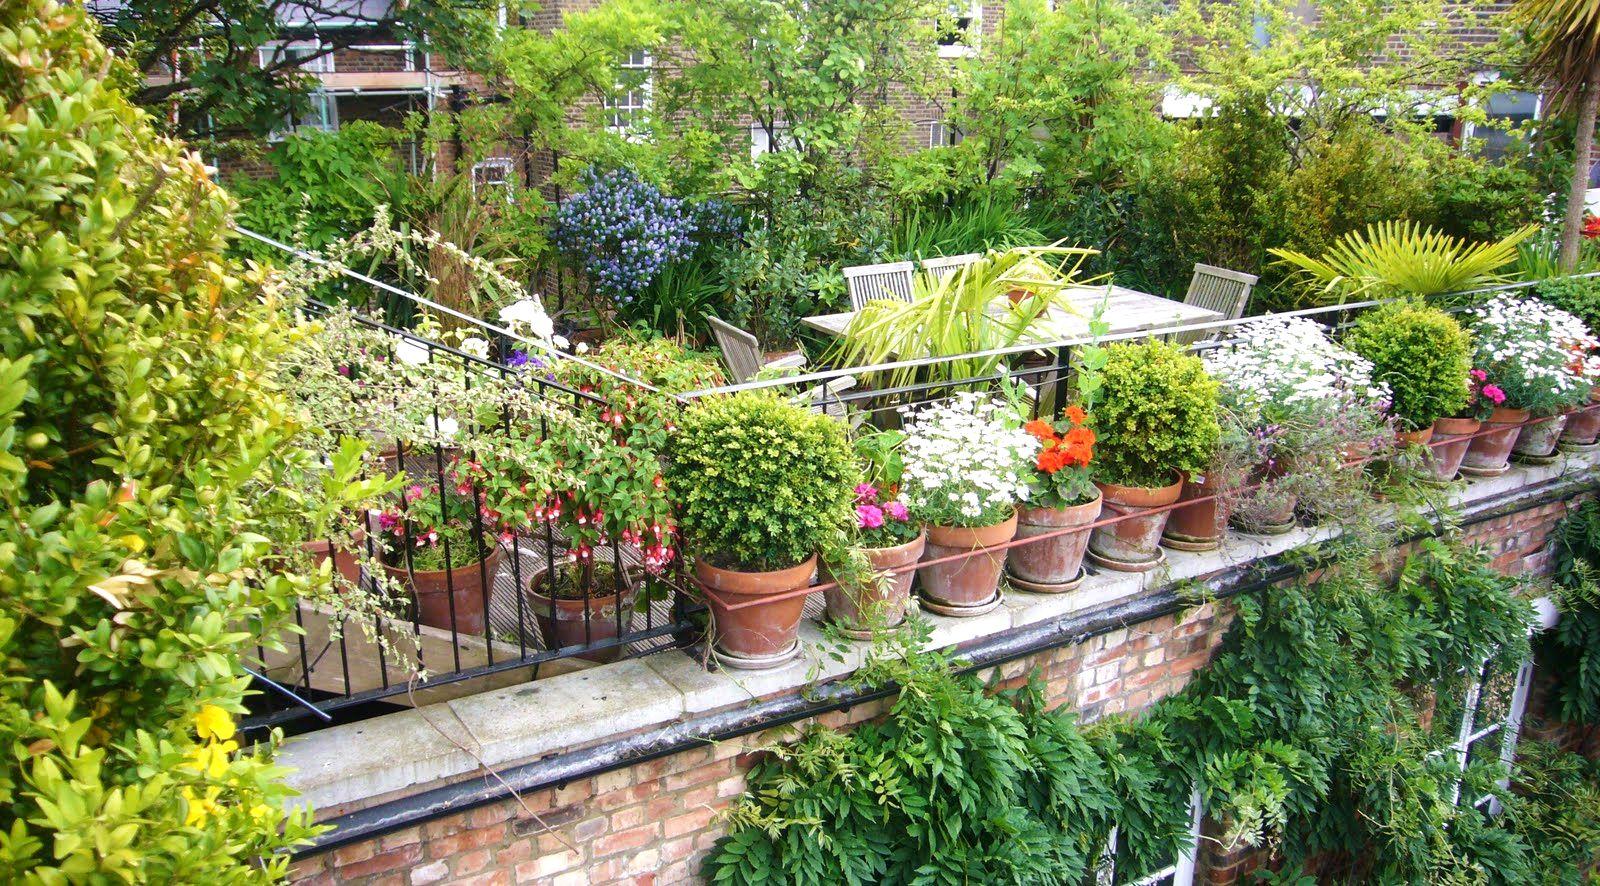 designing an urban vegetable garden photo - 2